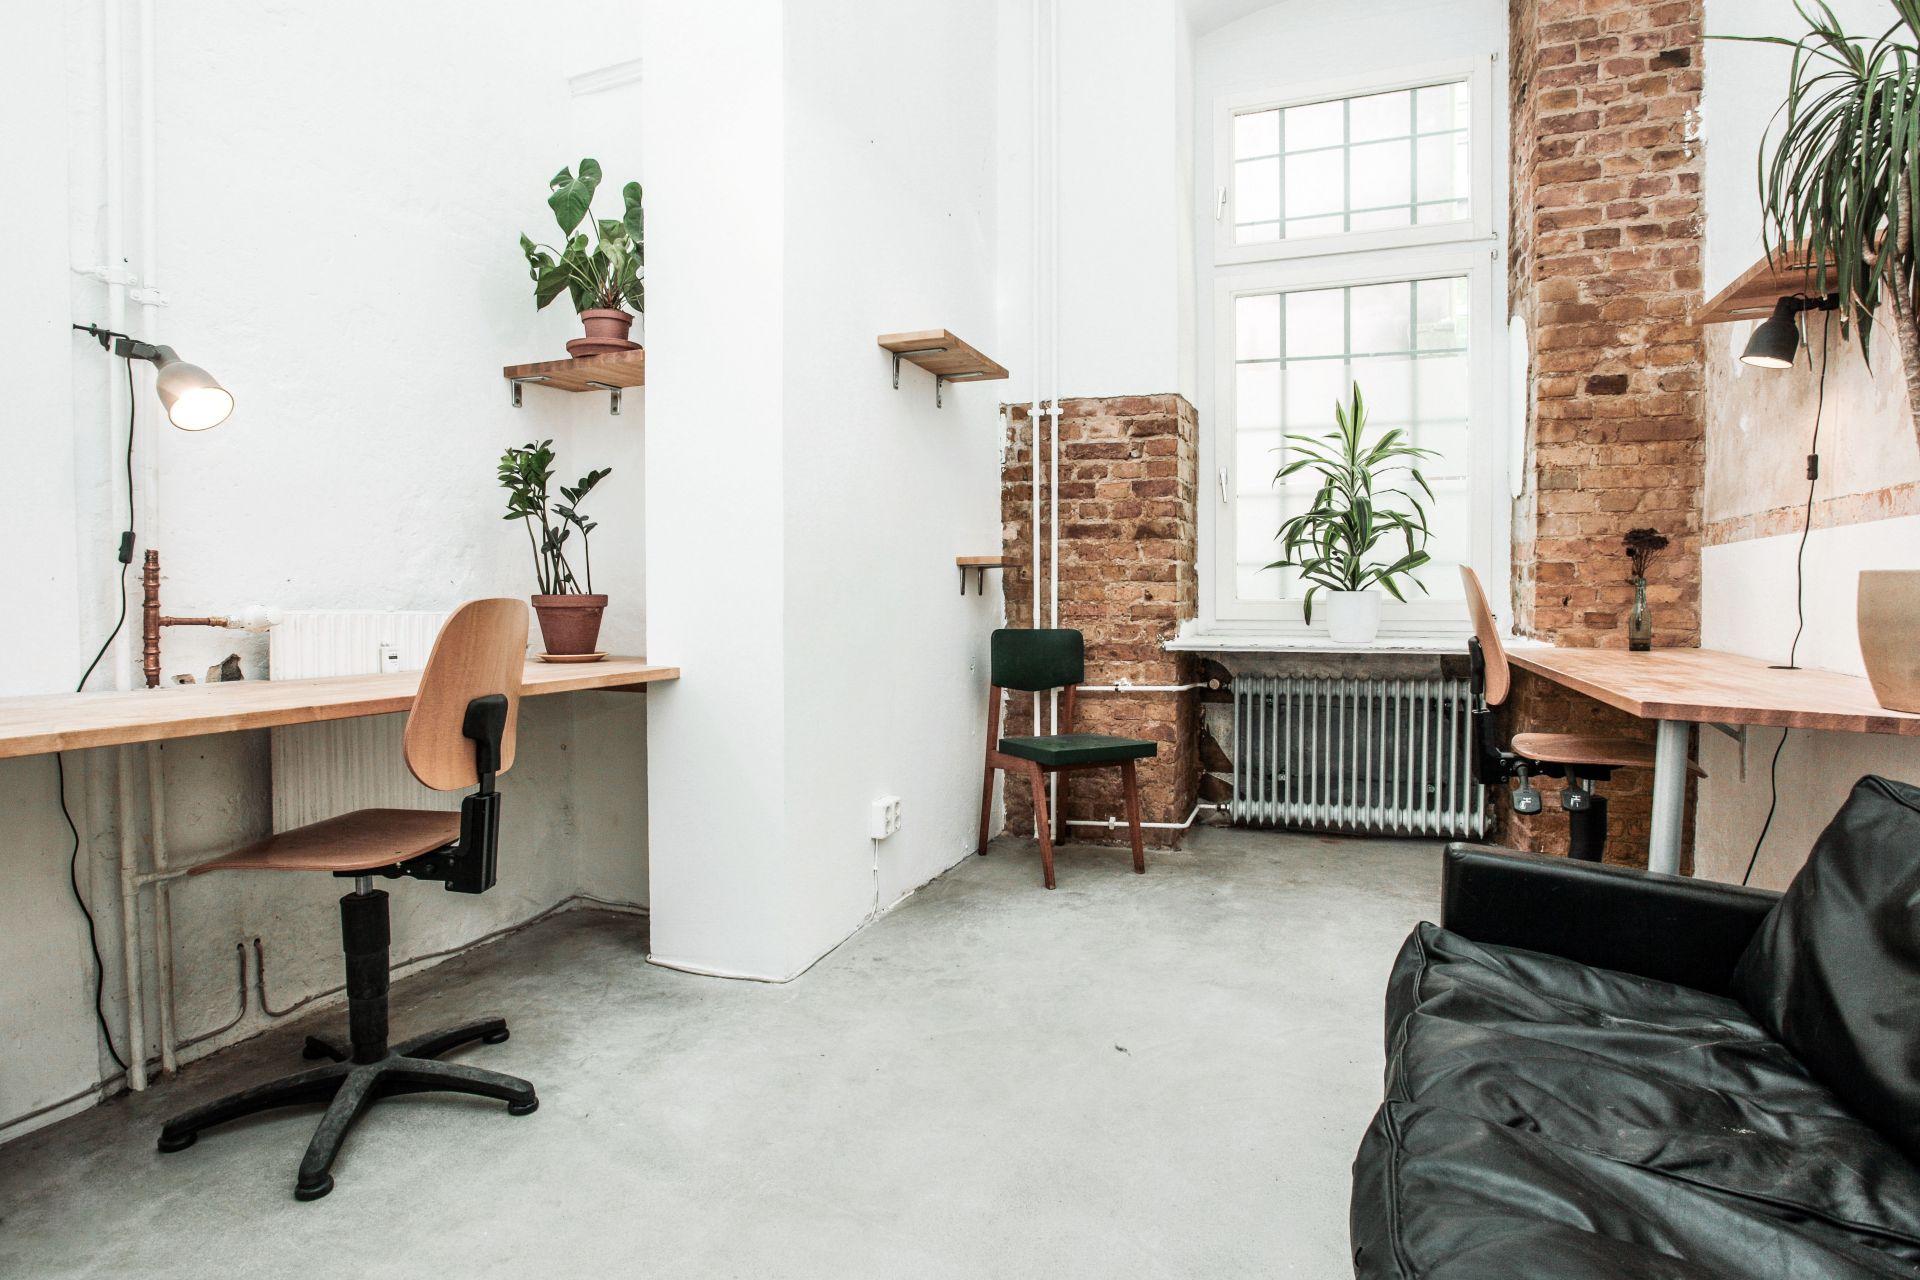 Blender studio, Berlin